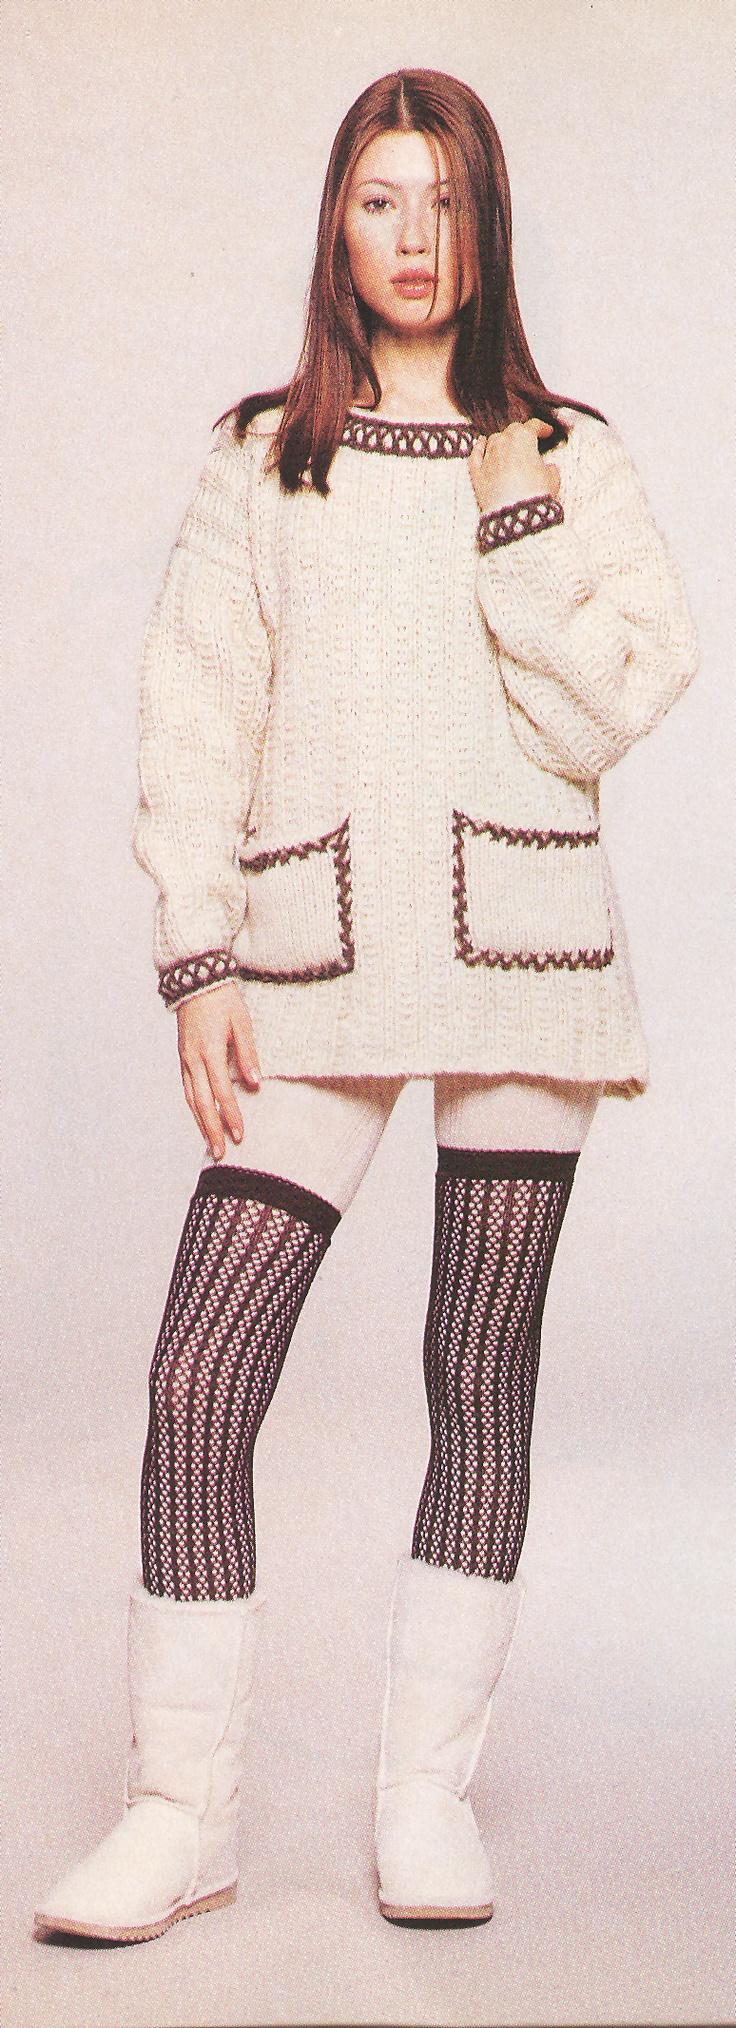 Knitting Vogue Free Patterns : Vogue pattern knit clothes pinterest